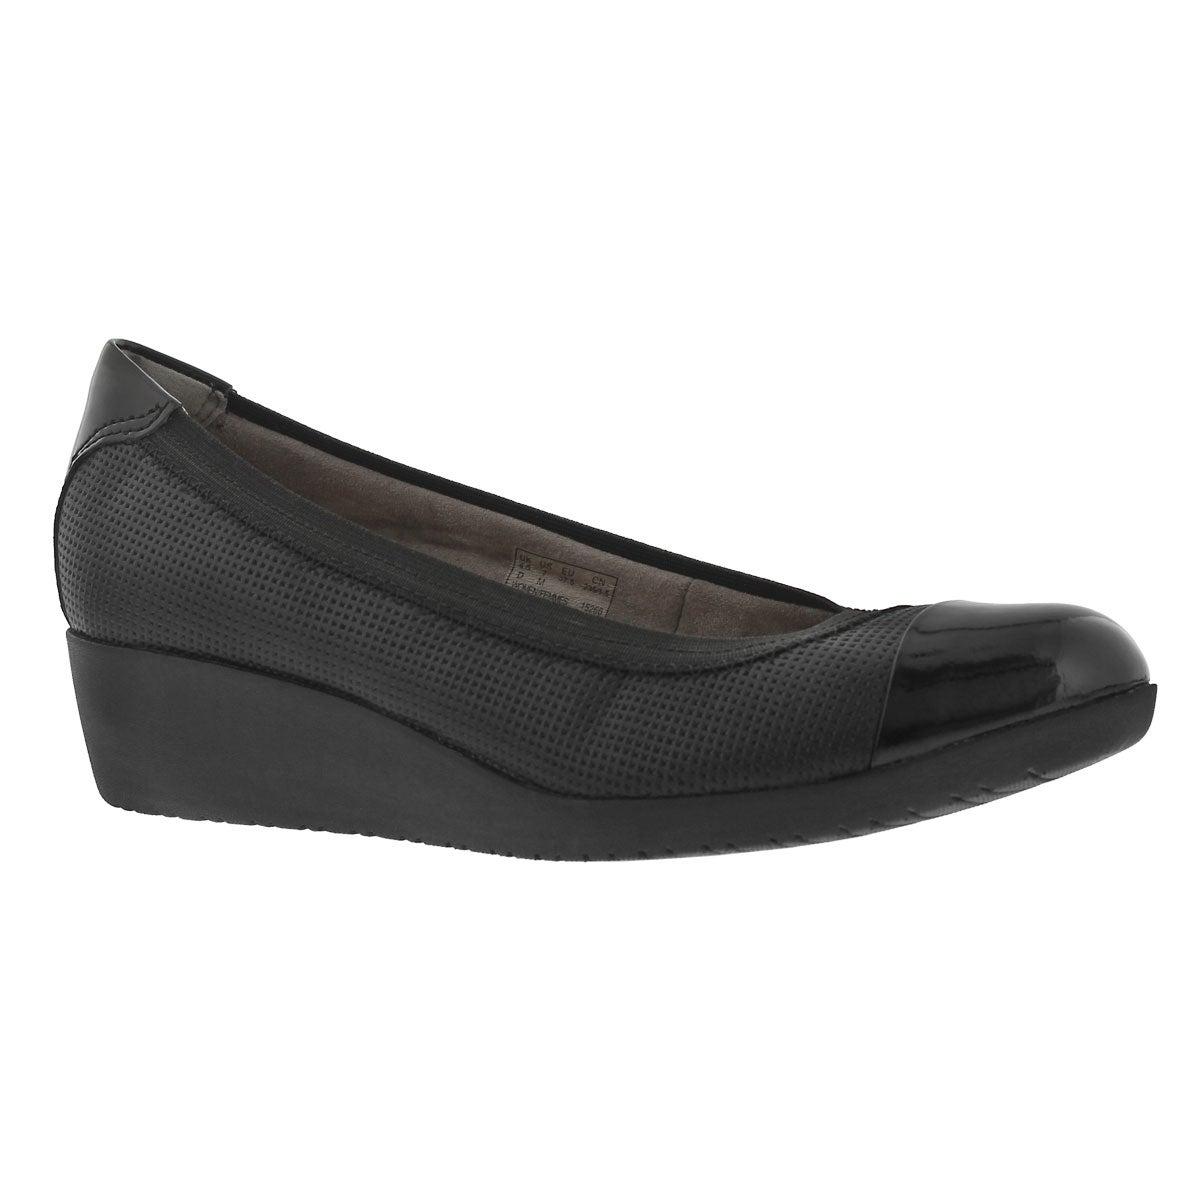 Women's PETULA SADIE black slip on wedges